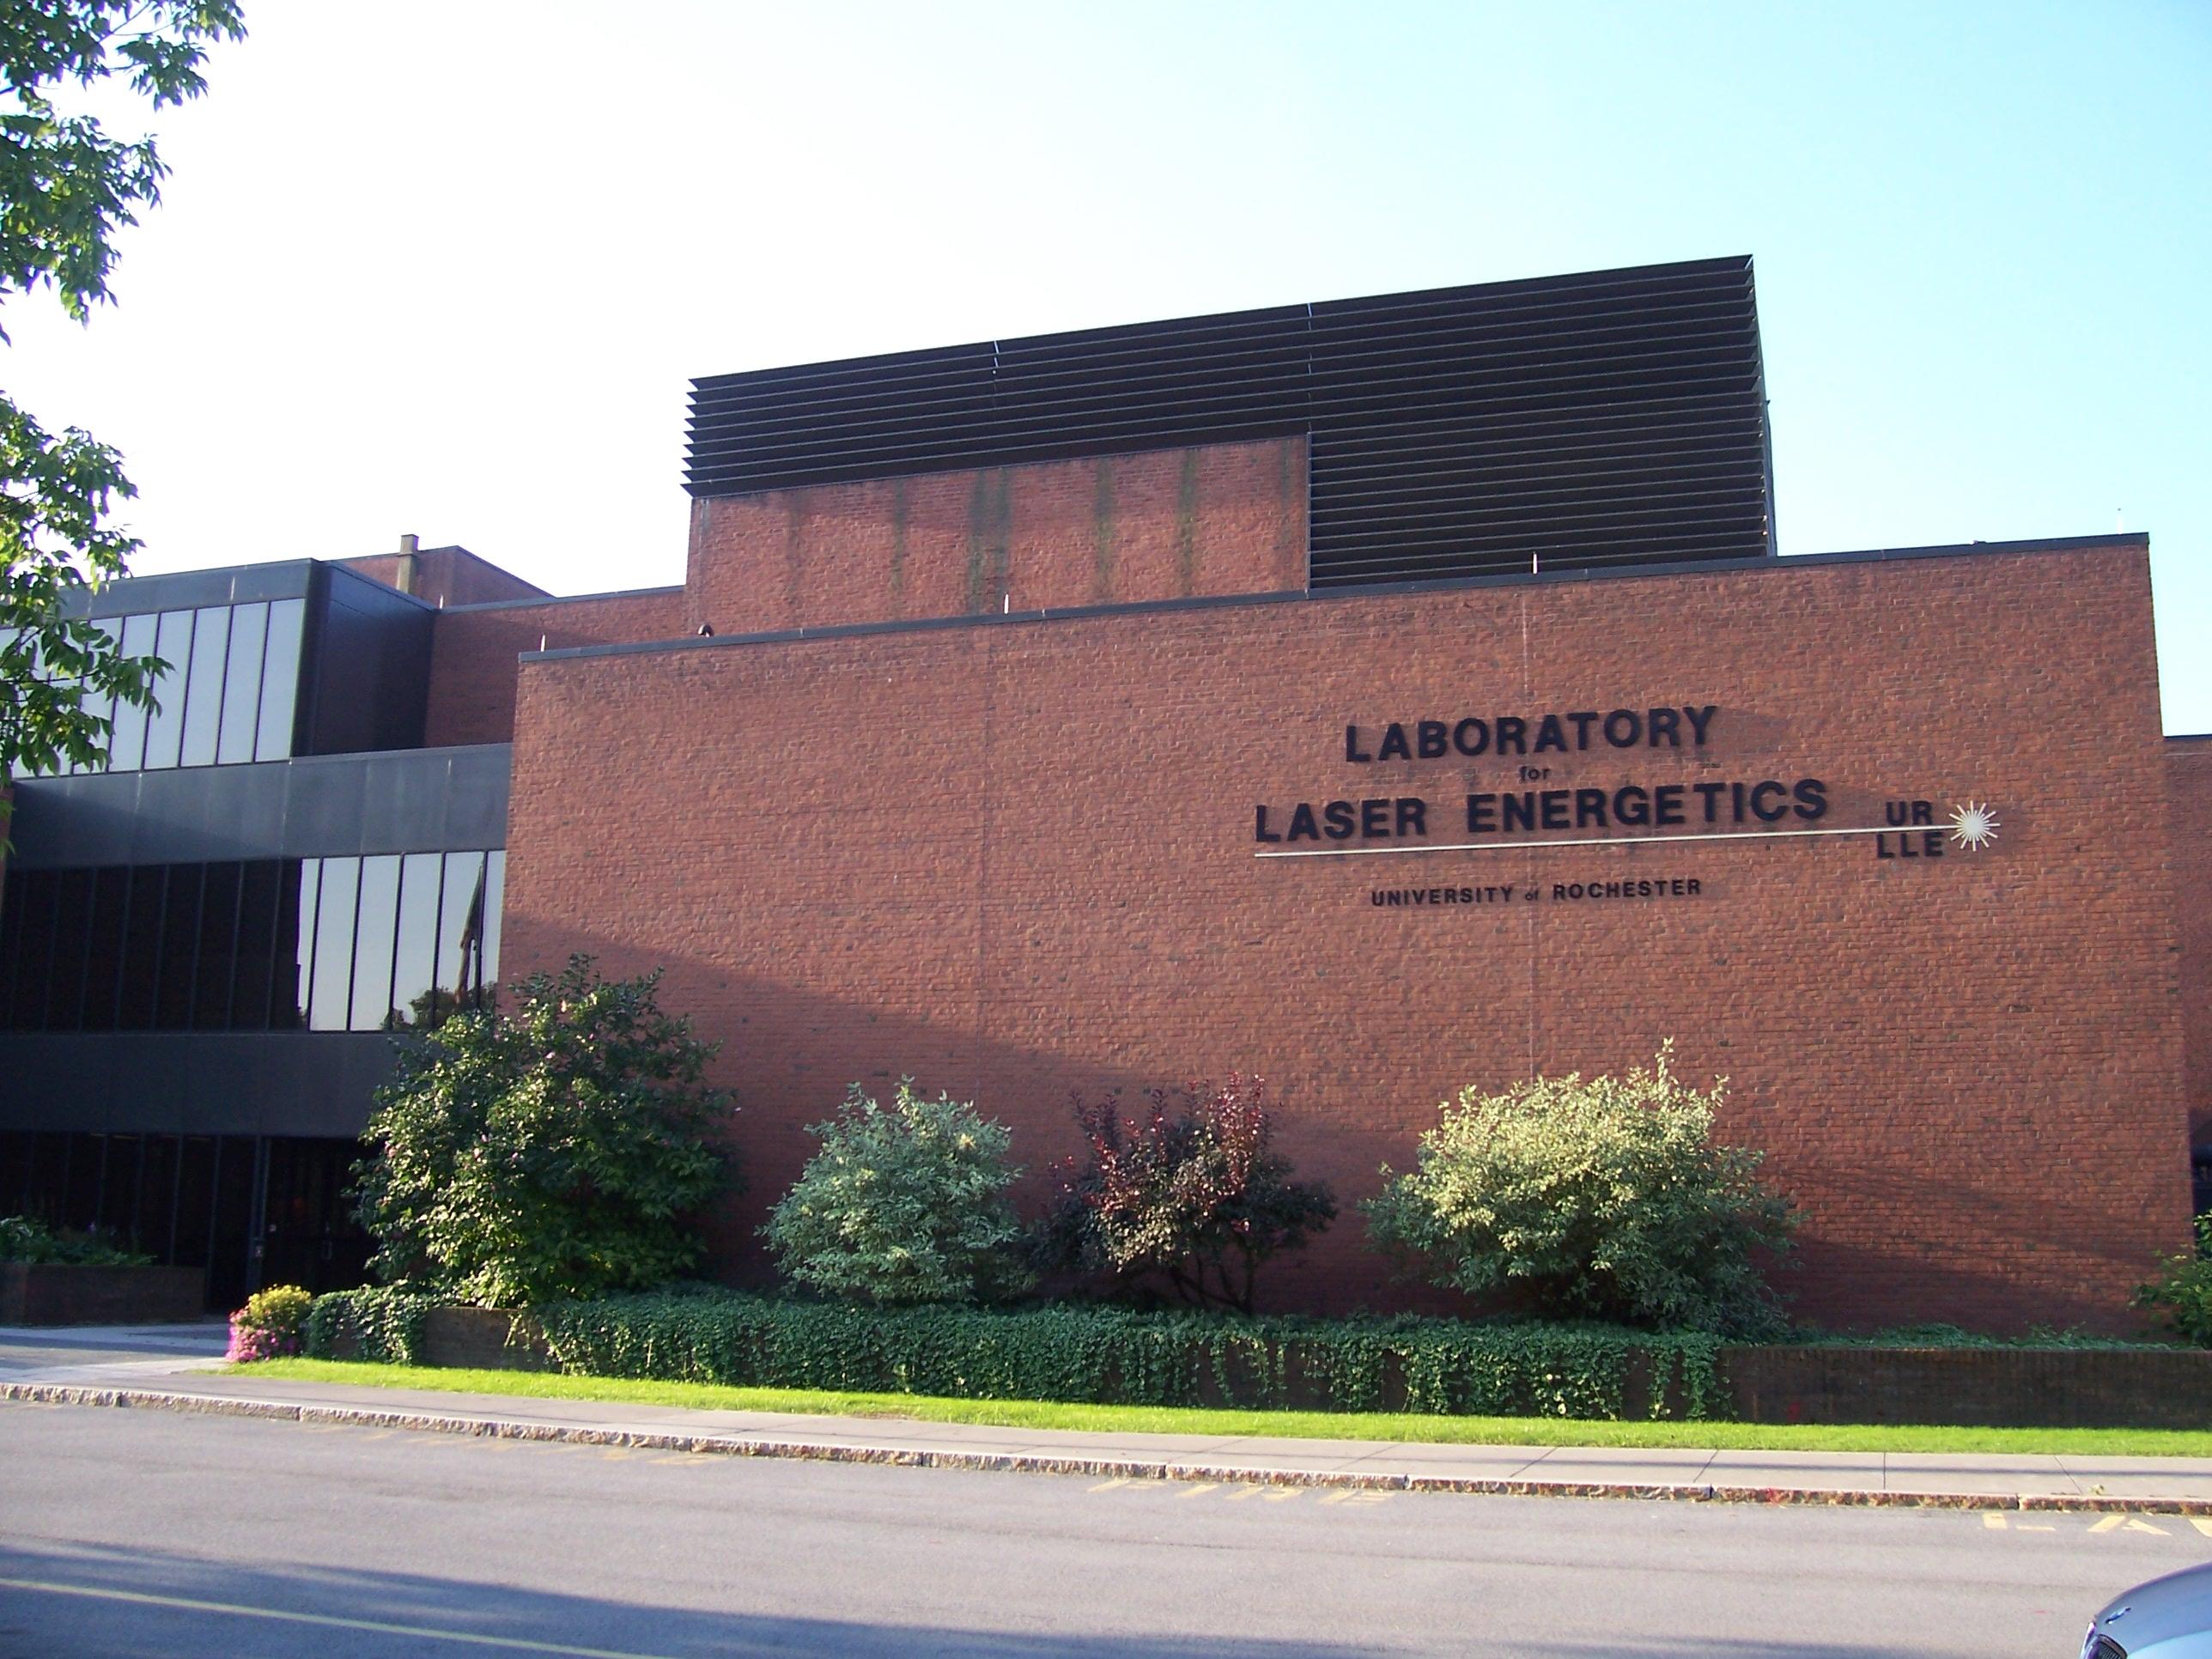 ur_laboratory_for_laser_energetics_main_entrance